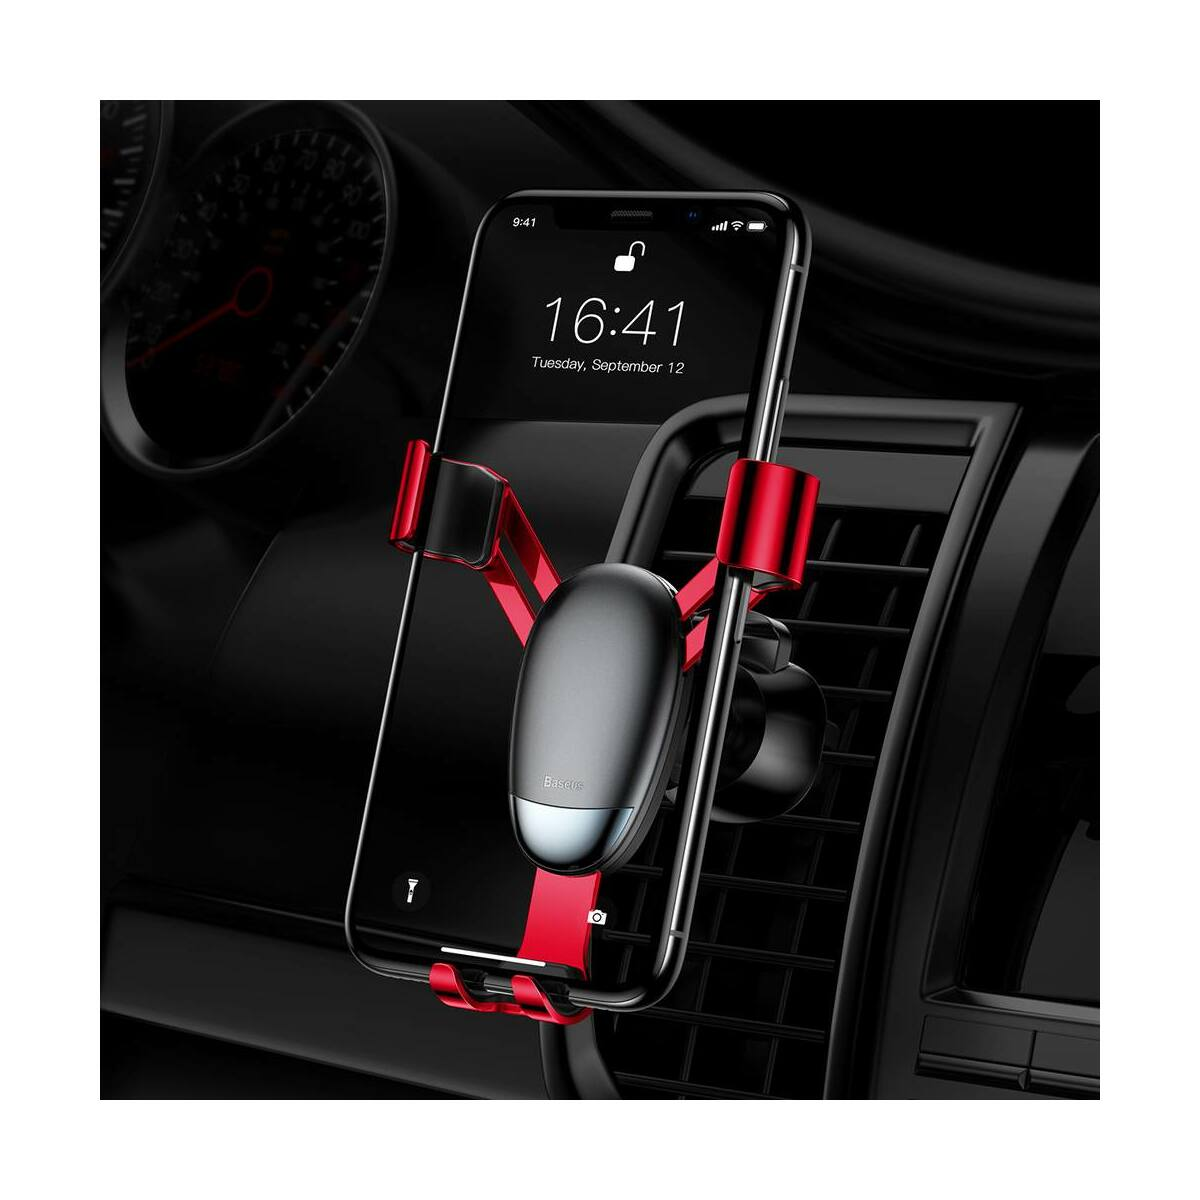 Baseus autós telefontartó, Mini gravity holder, piros (SUYL-G09)